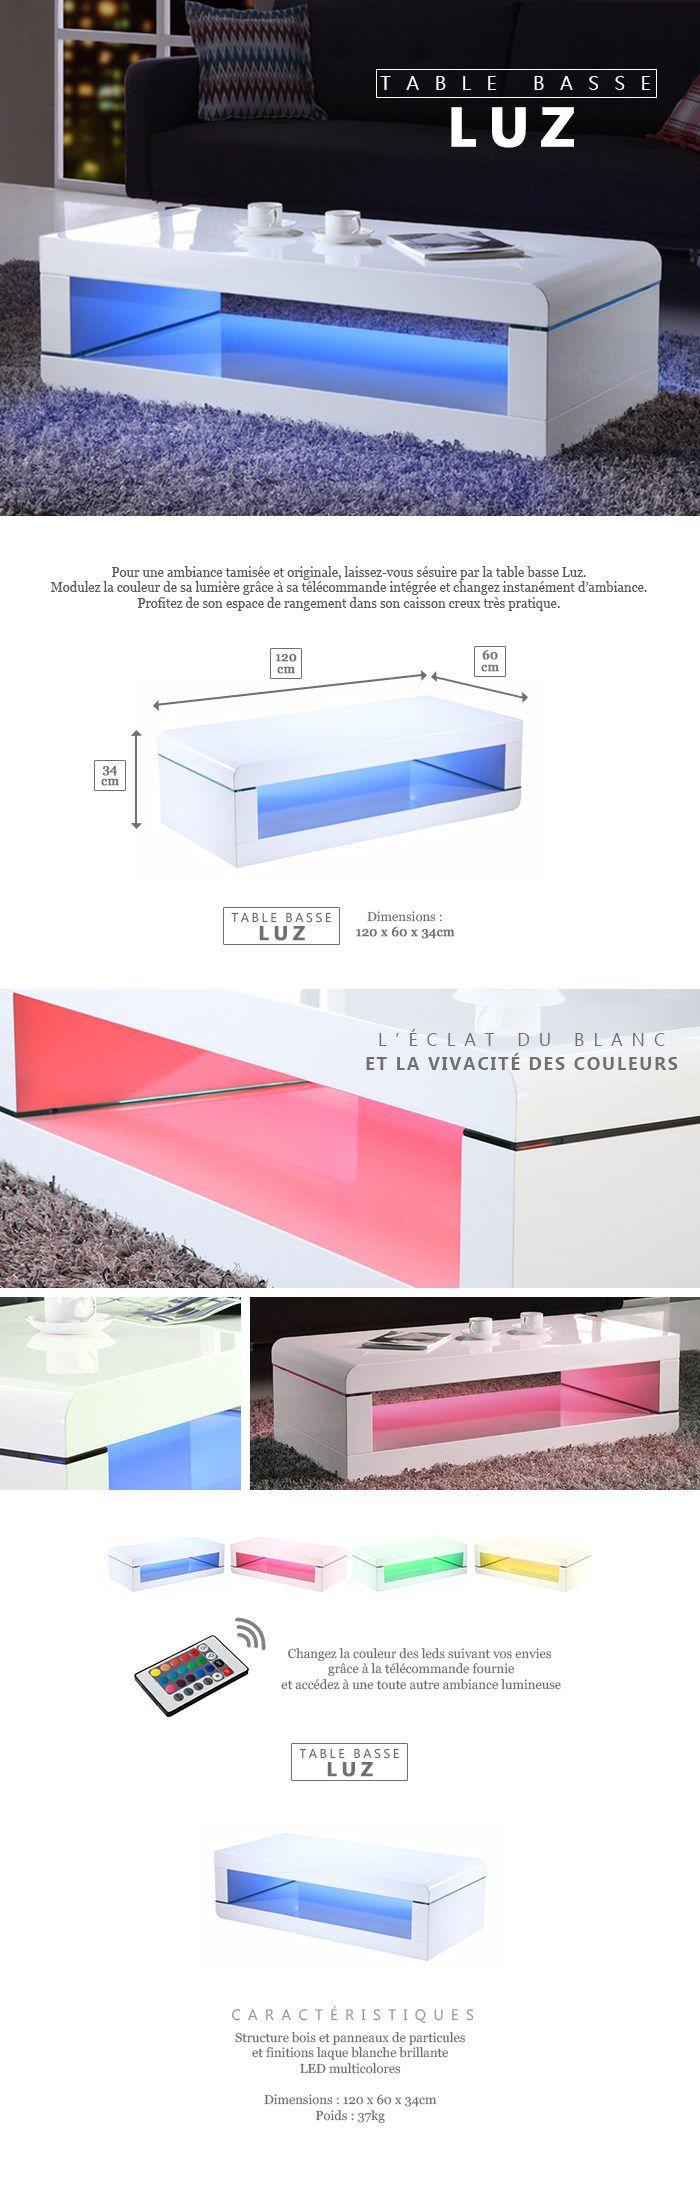 LUZ Table basse avec LED multicolore style contemporain laqué blanc brillant - L 120 x l 60 cm